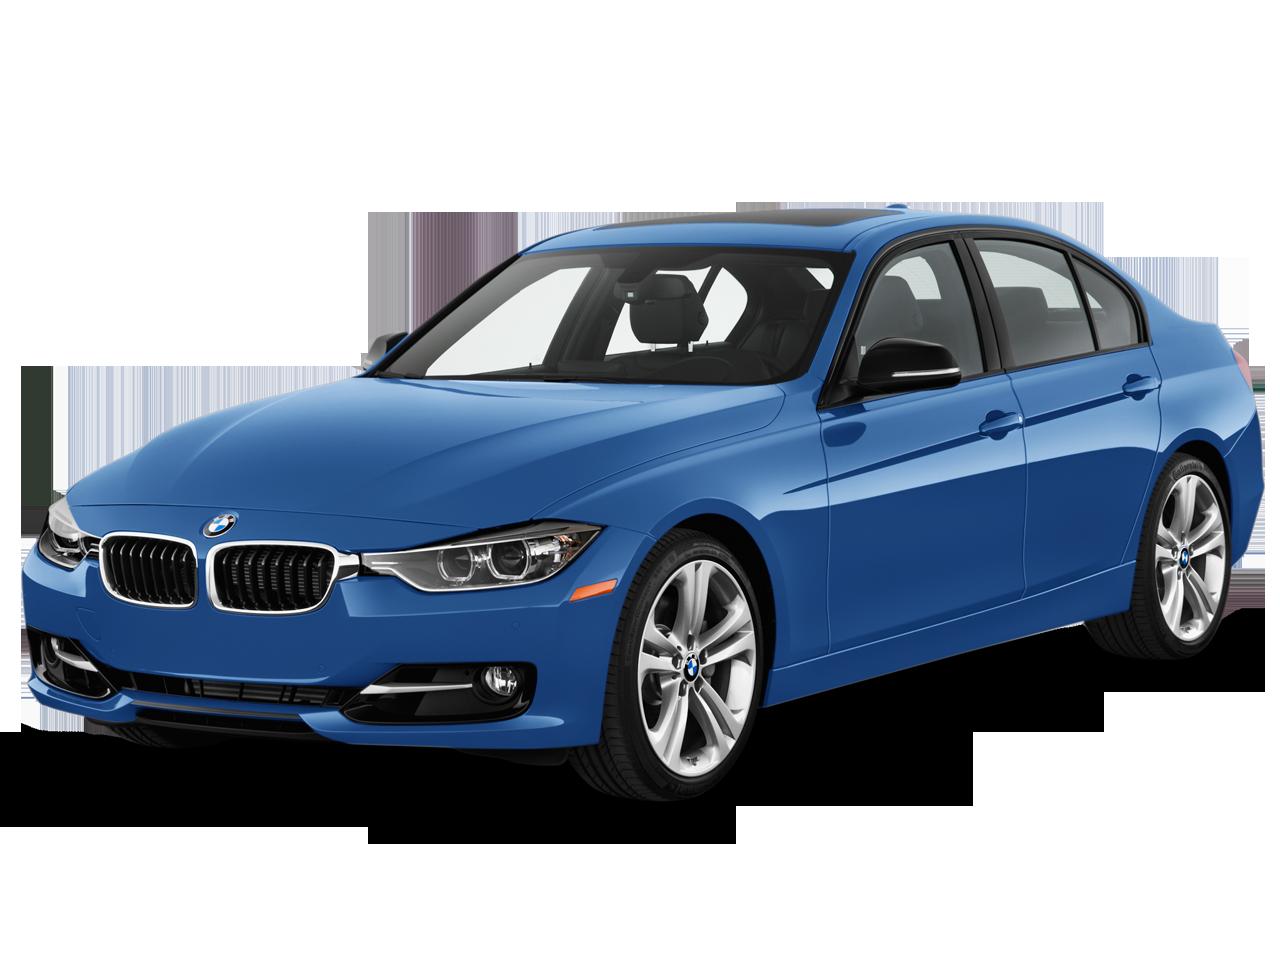 BMW PNG фото, БМВ скачать фото